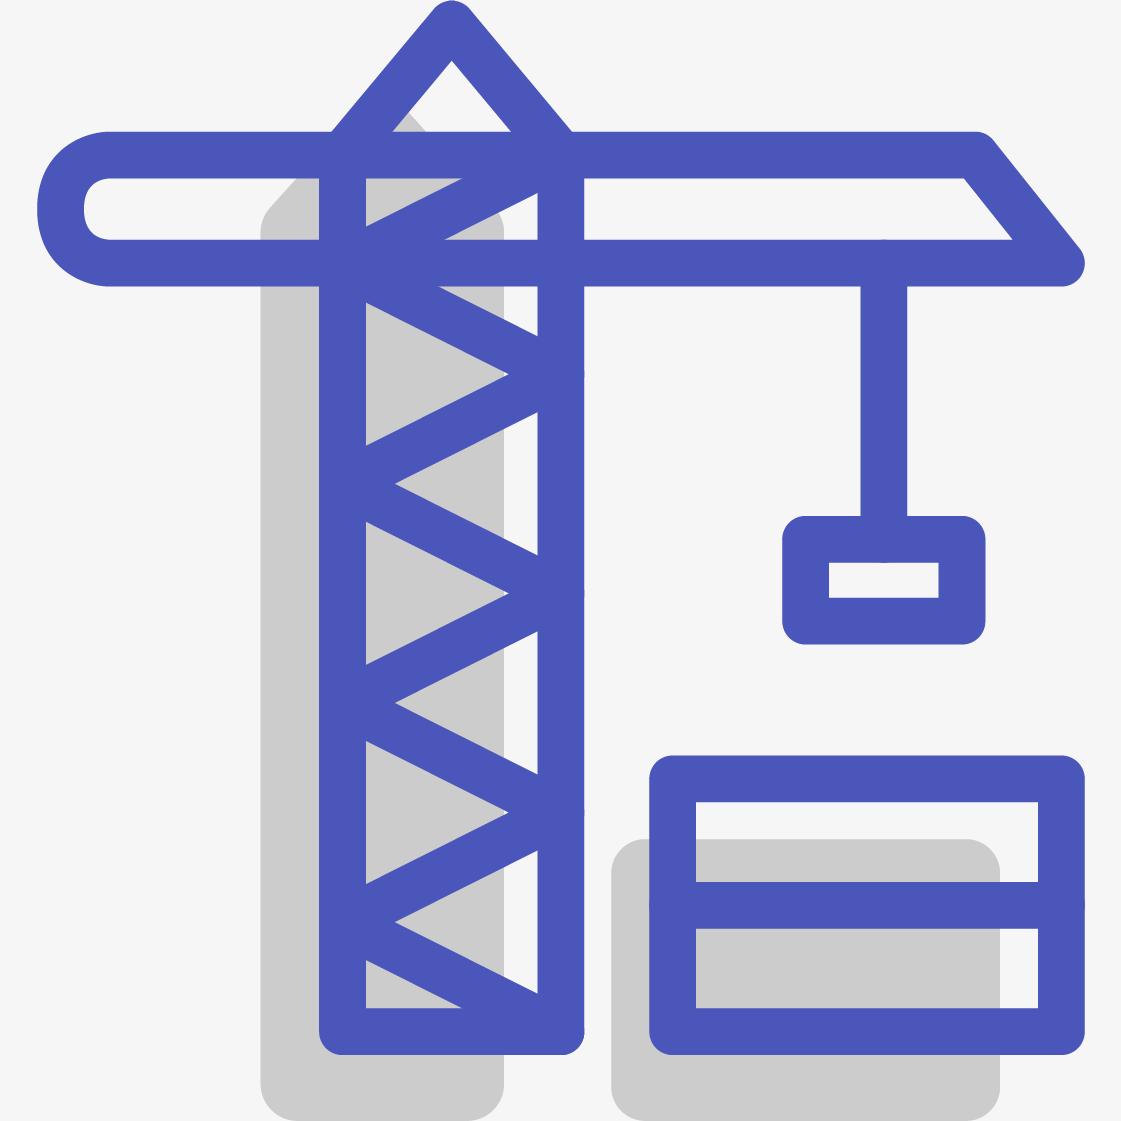 Construction Sliders to control all development assumptions.